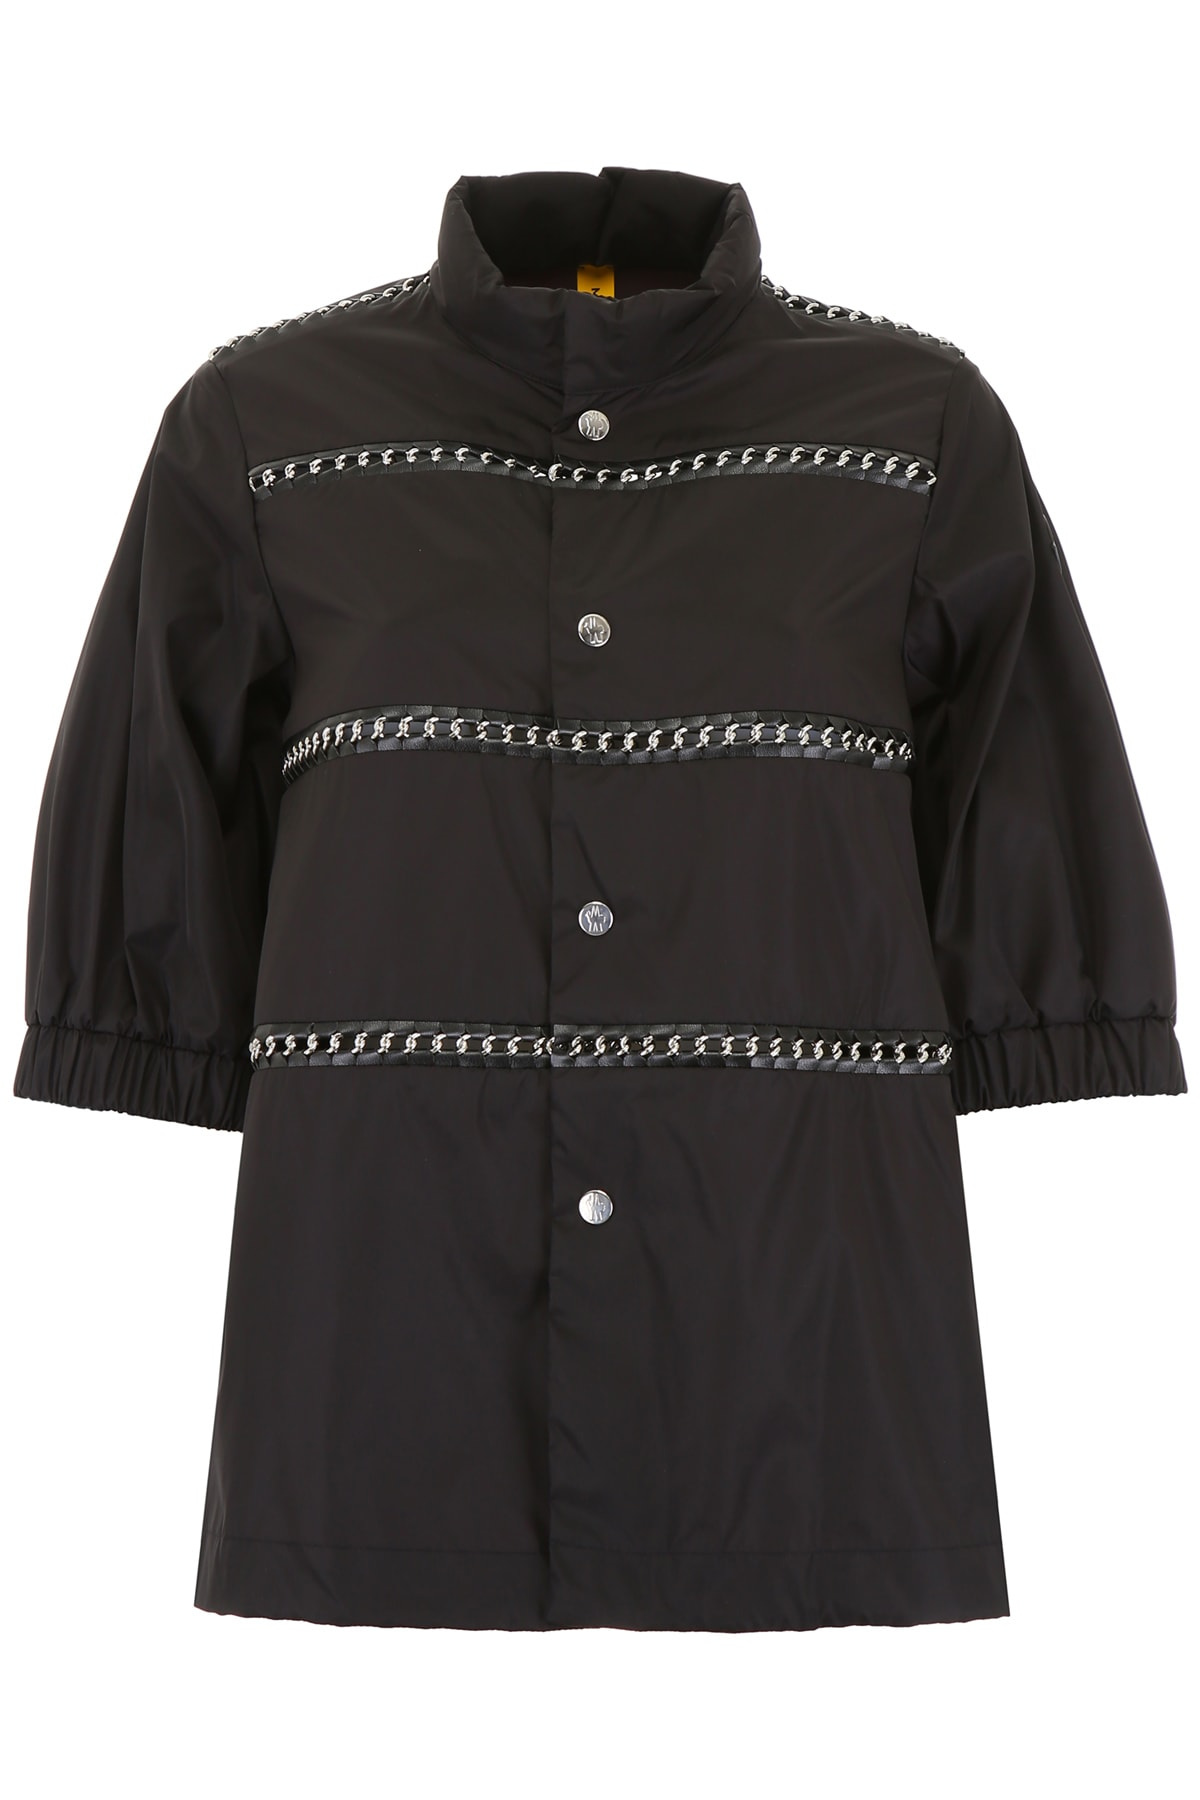 Moncler Moncler Genius 6 Silver Jacket